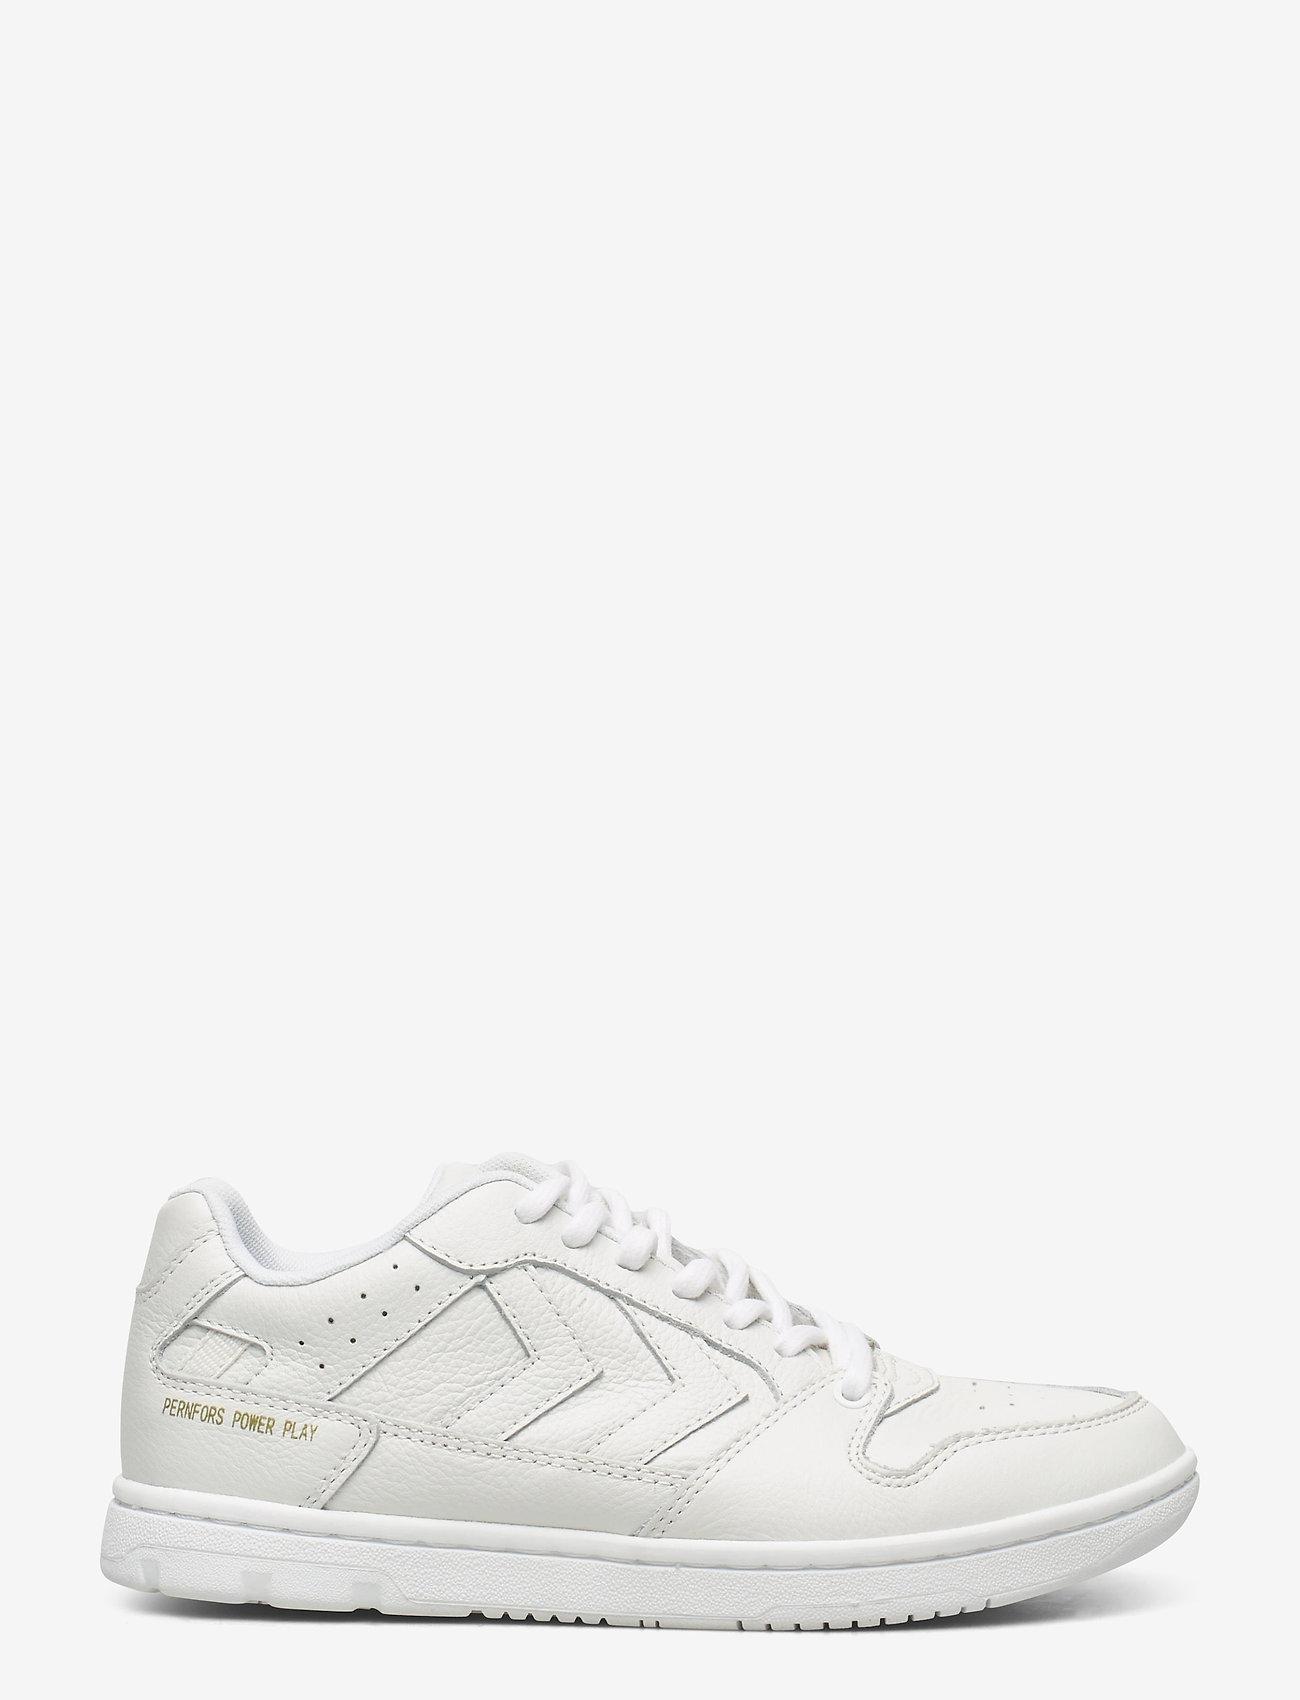 Hummel - POWER PLAY SNEAKER - laag sneakers - white - 0